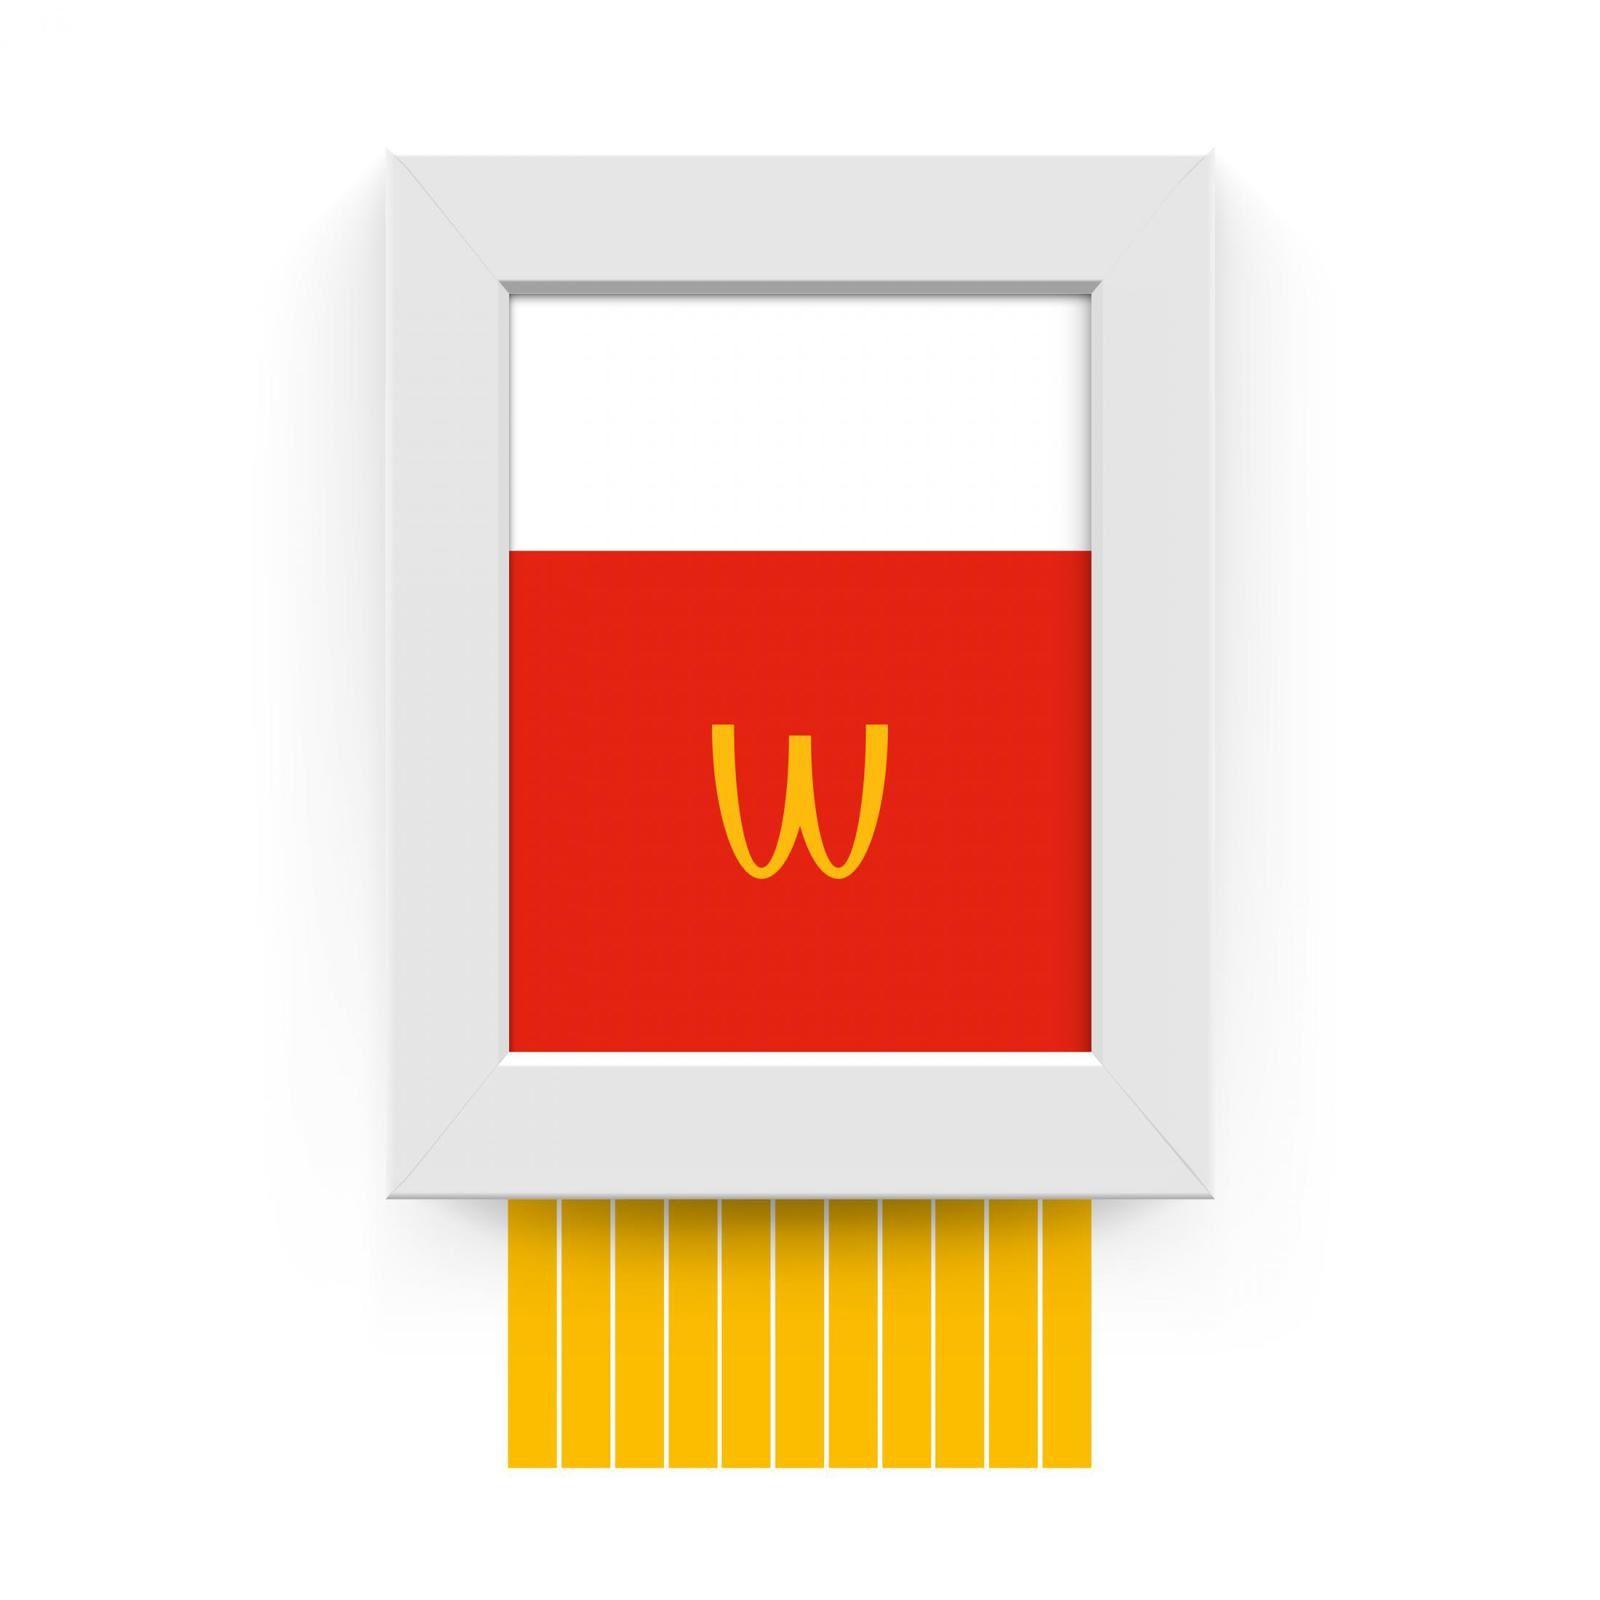 "McDonald's : ""McBanksy"" I Agence : DDB, Vienne, Autriche (octobre 2018)"